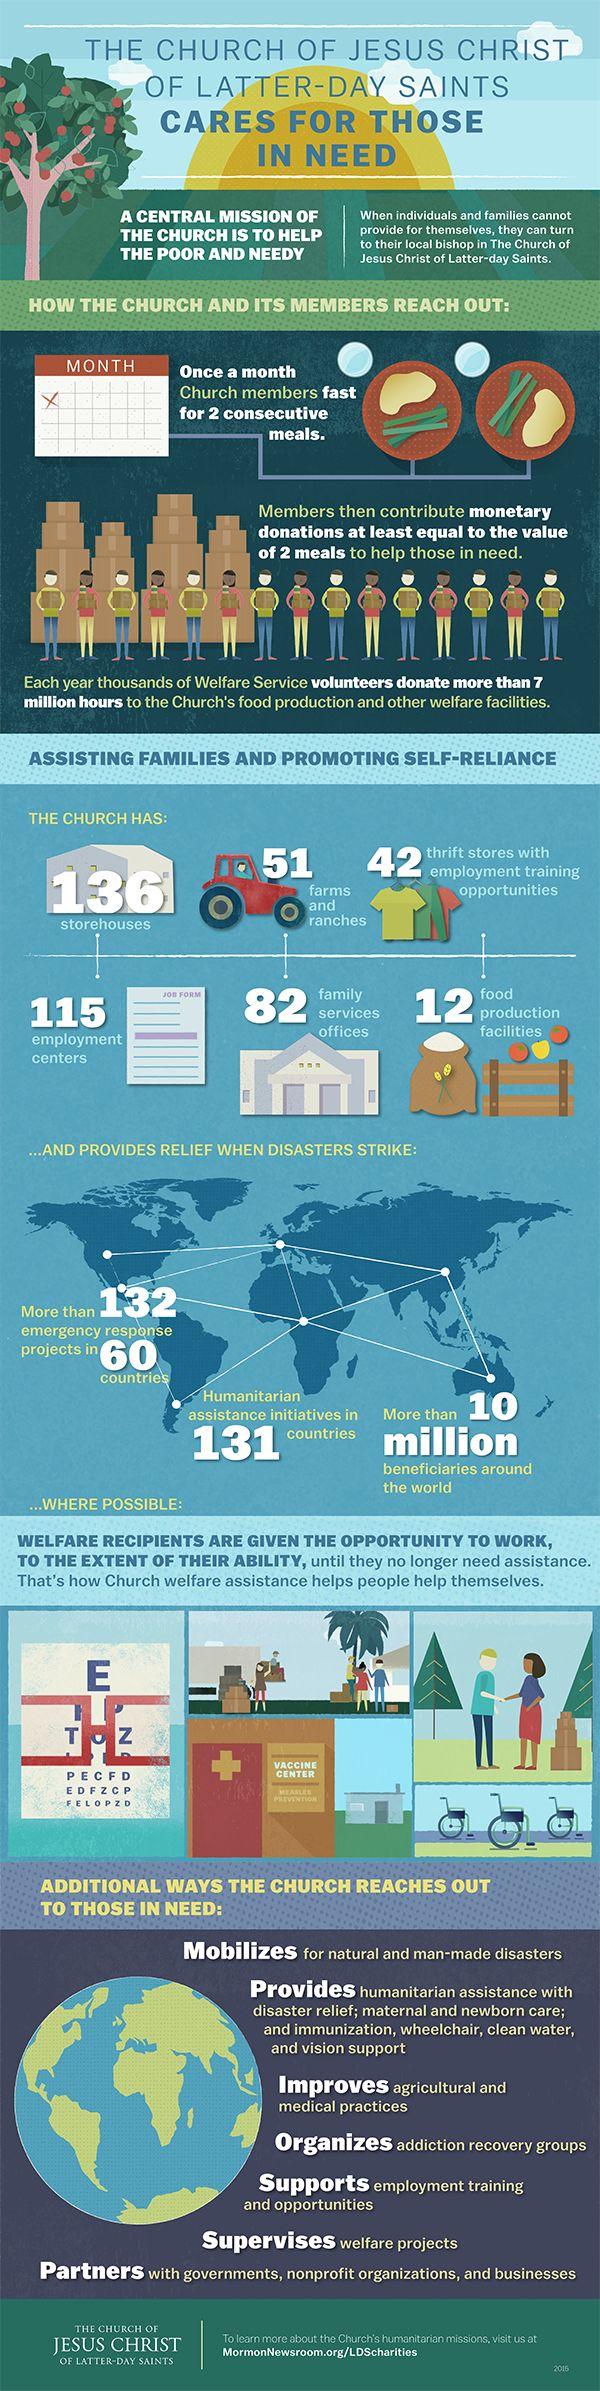 LDS Charities Focuses on Humanitarian Efforts